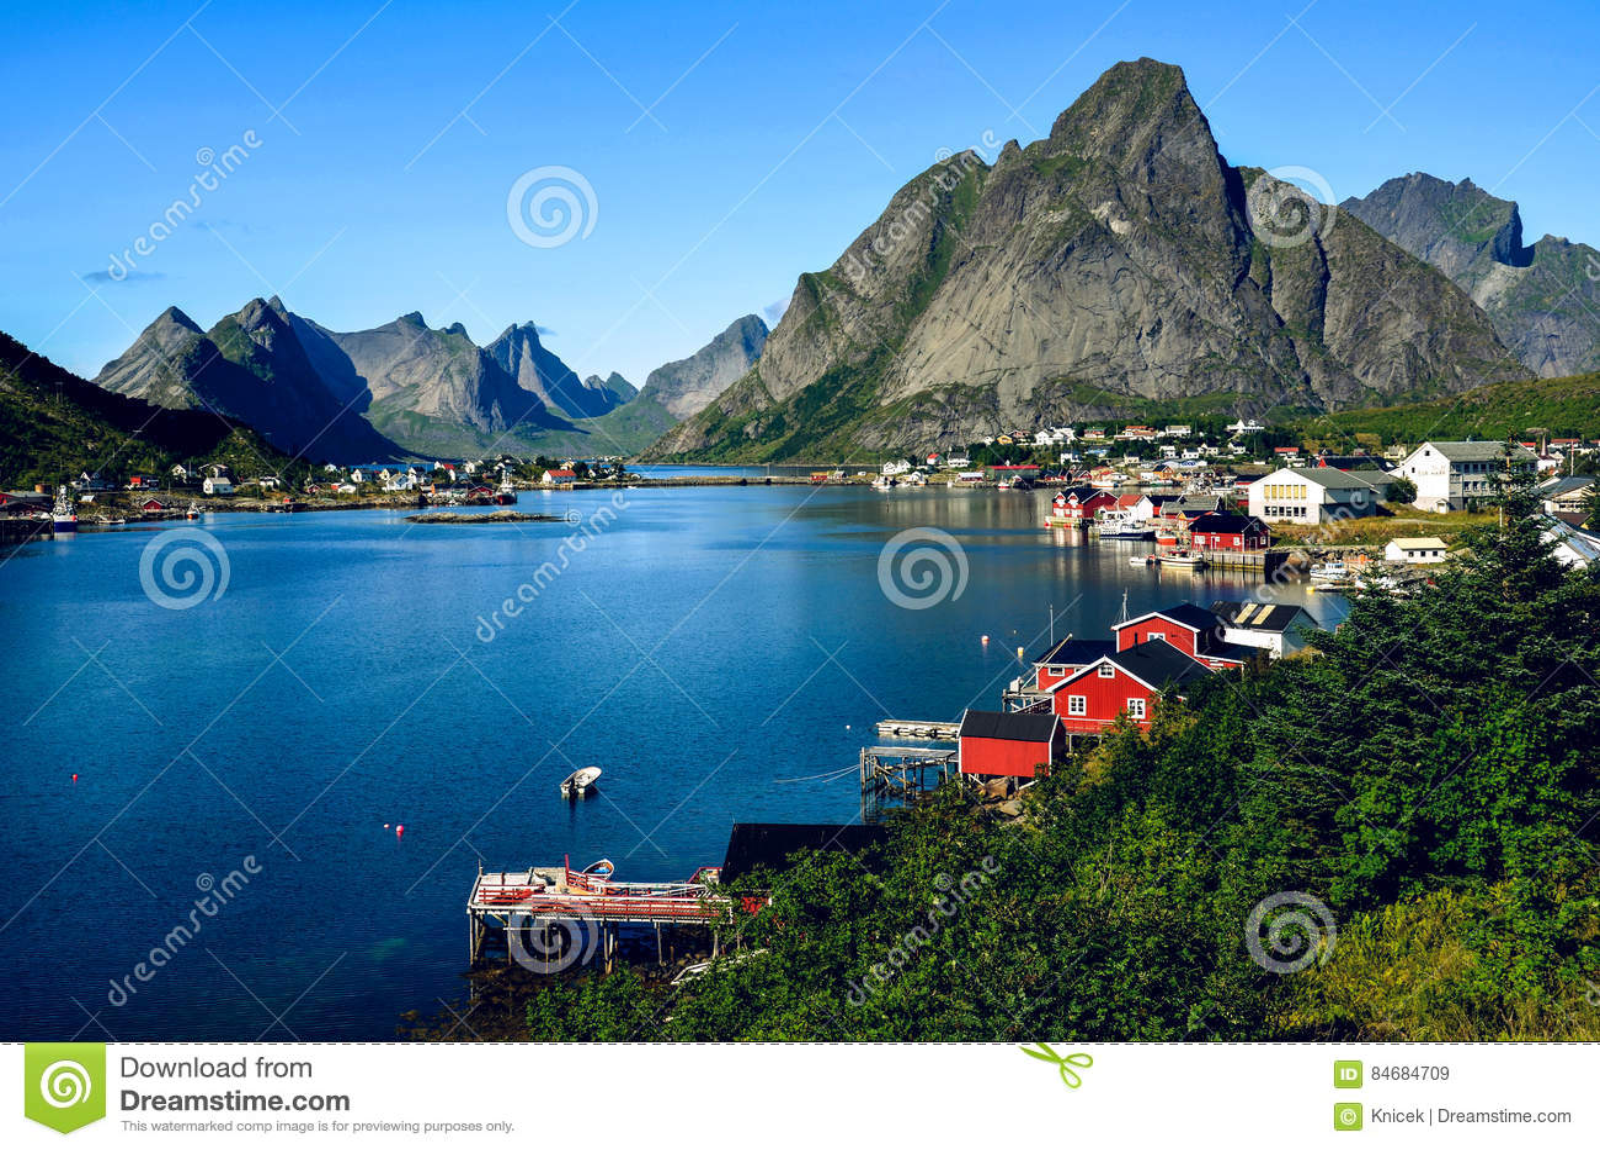 Ville de reine dans lofoten norv ge pendant l 39 t image for Piscine des 3 villes hem